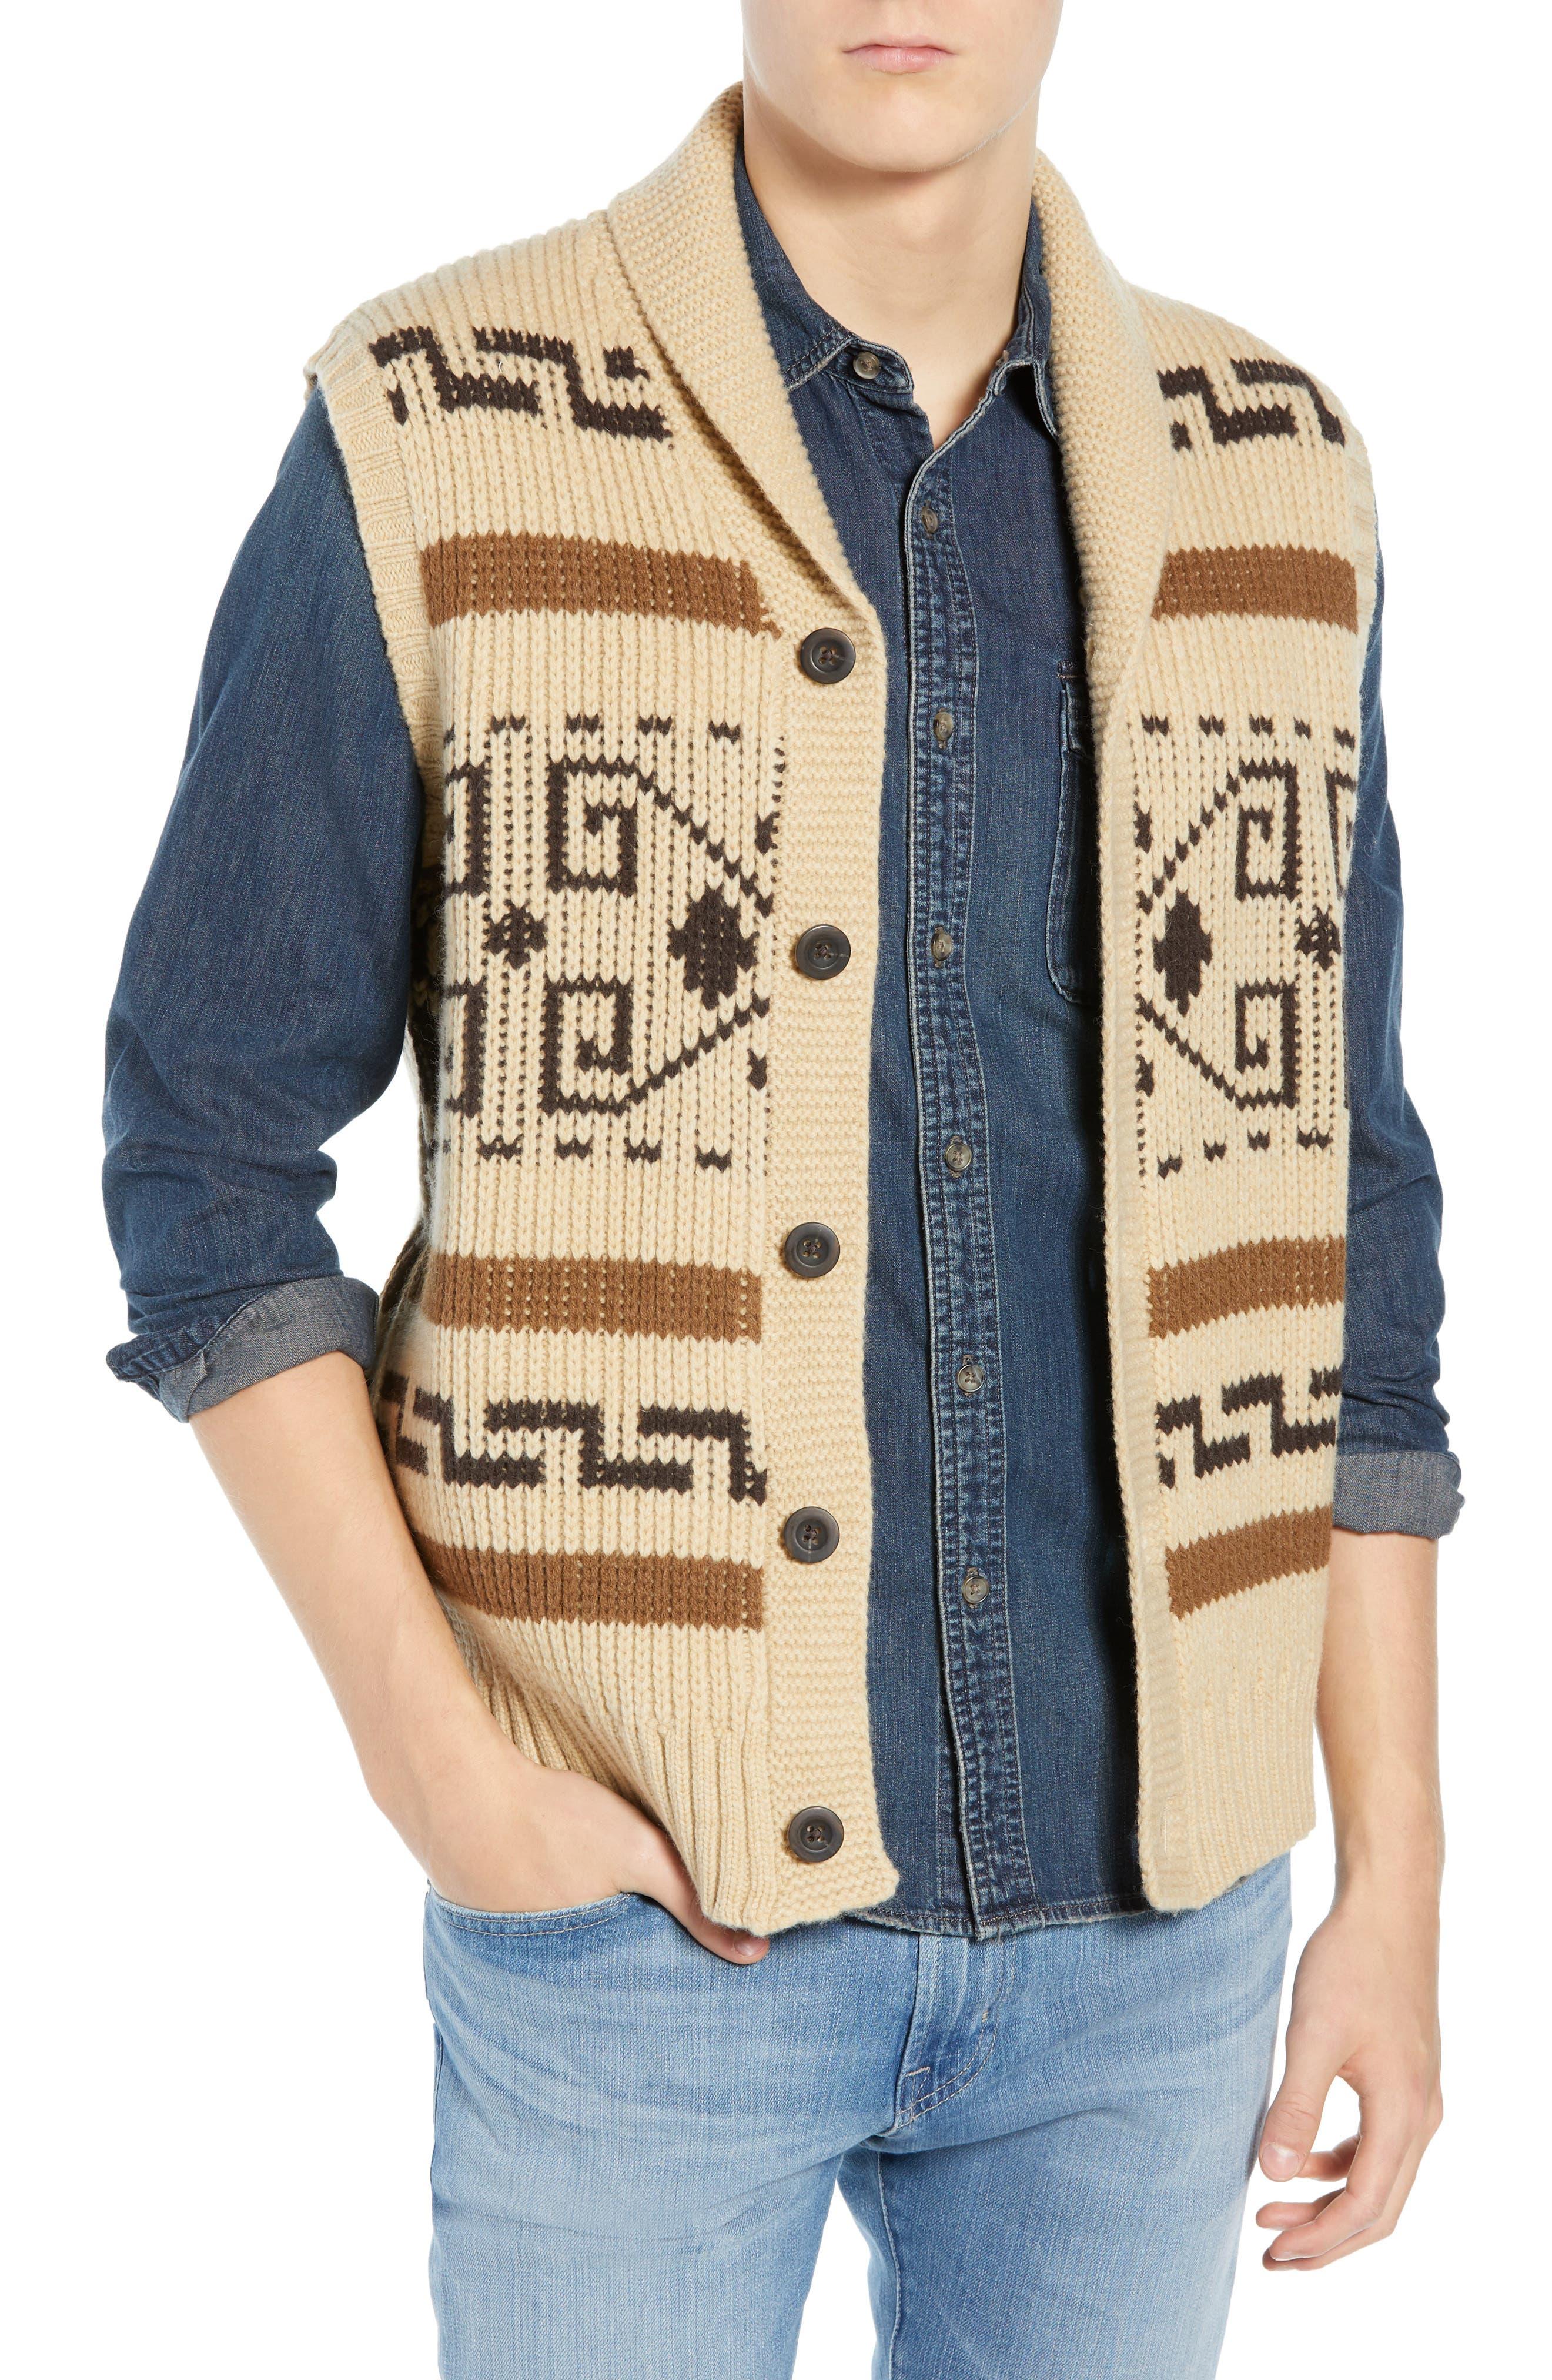 Original Westerley Sweater Vest,                         Main,                         color, TAN/ BROWN